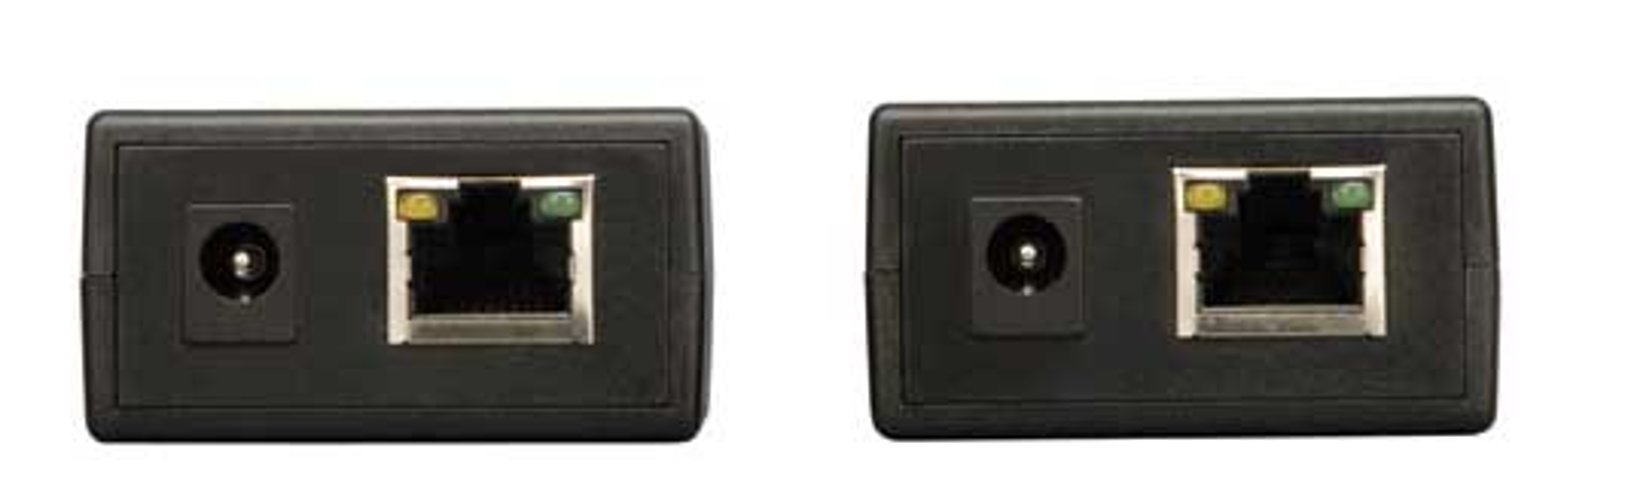 Tripp Lite B165-101 Extender Kit RS232/Cat5 B165-101